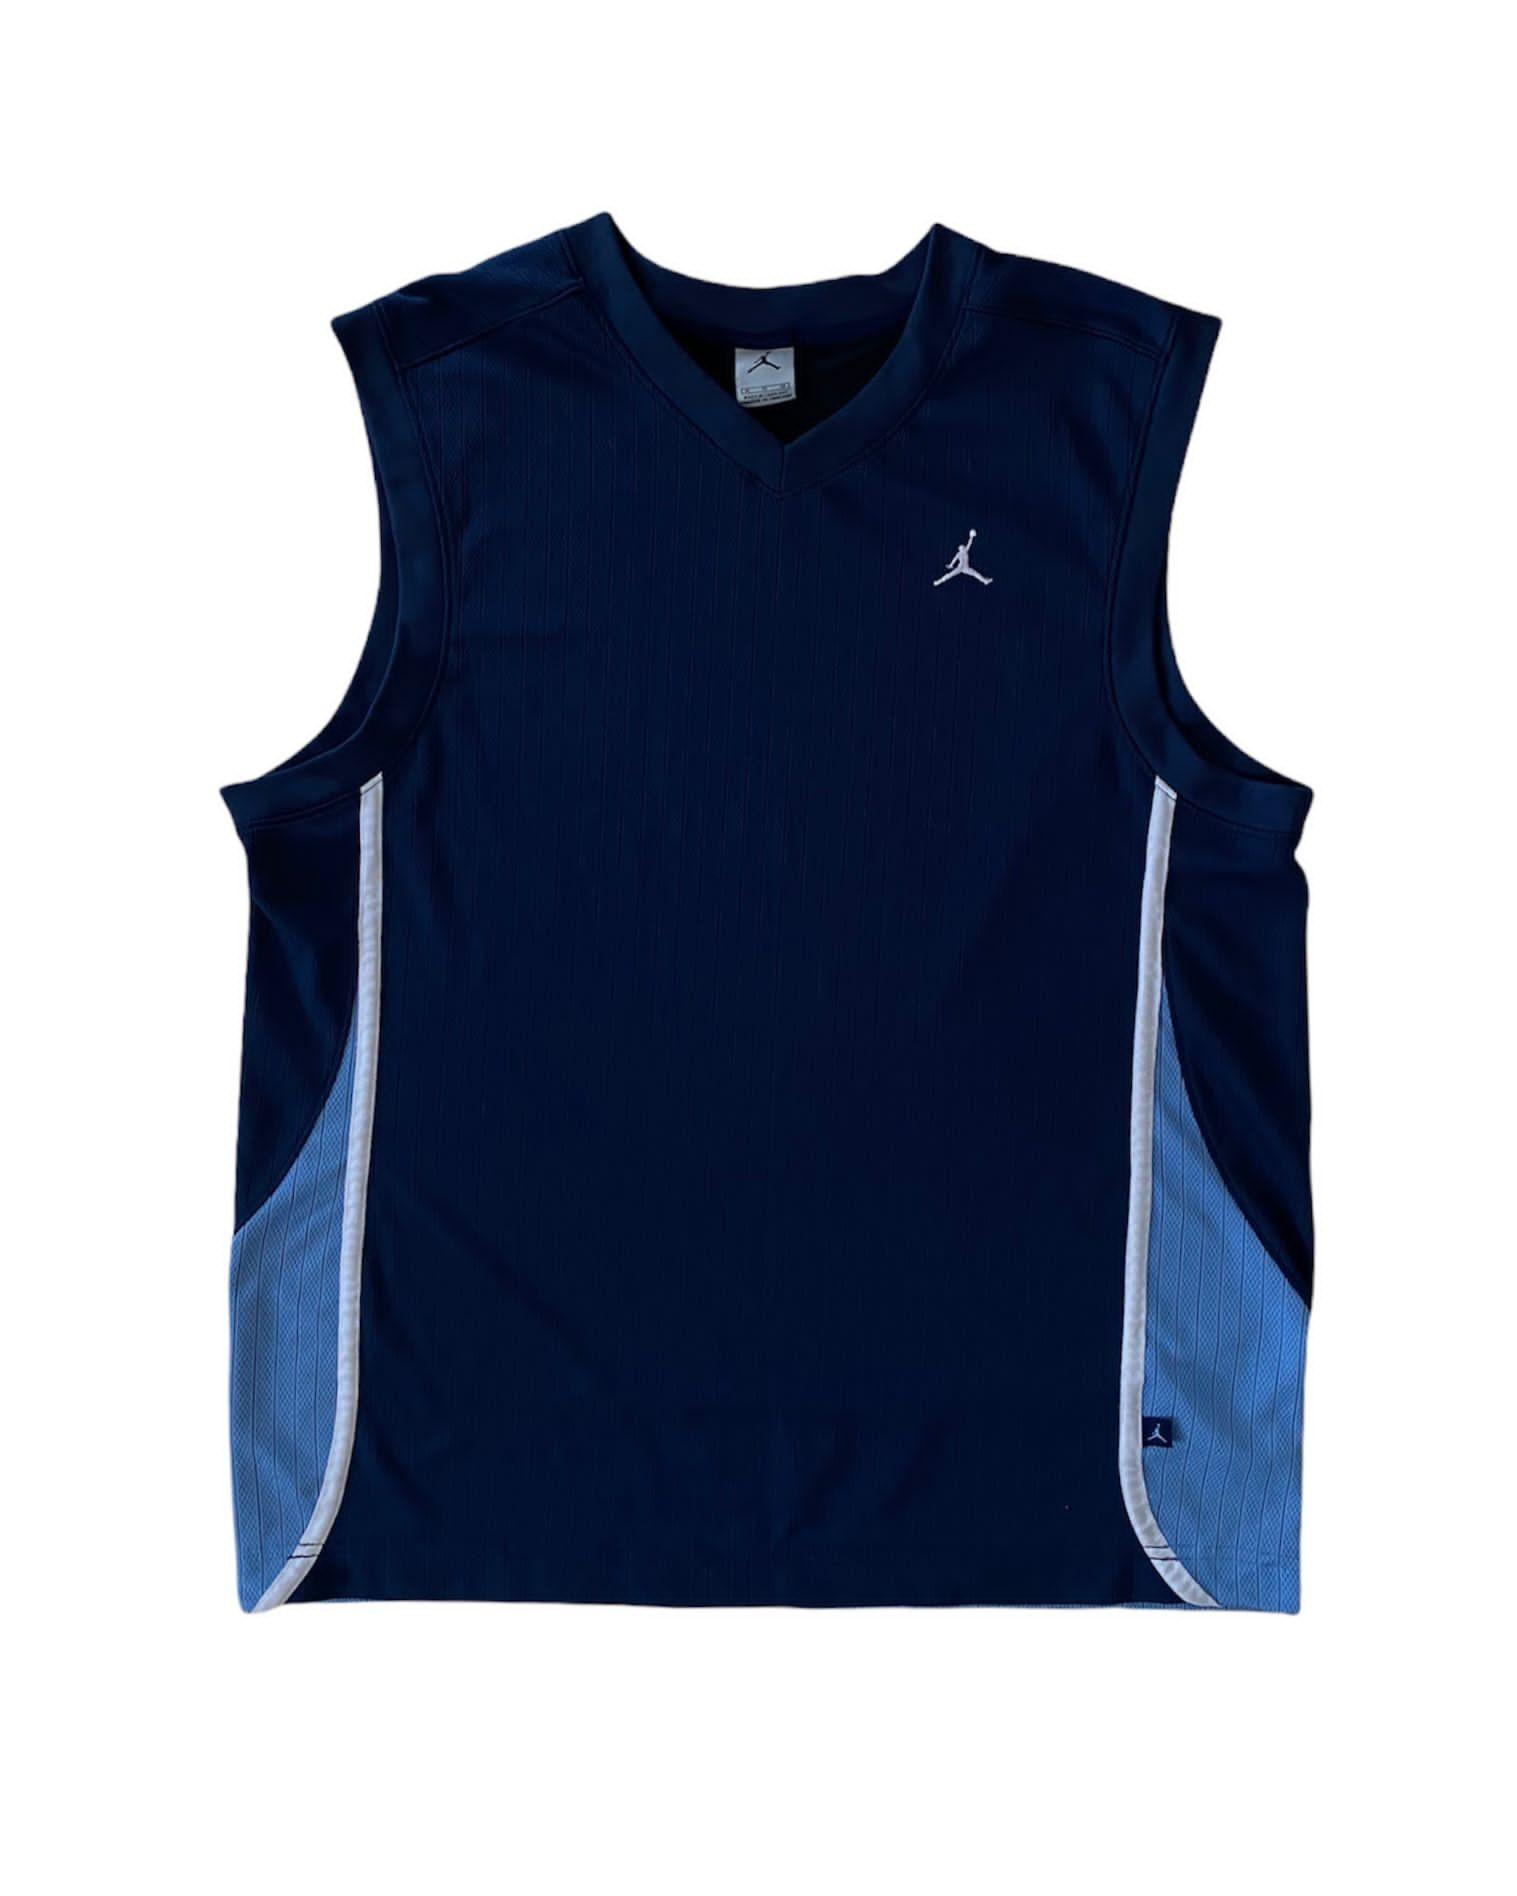 Air Jordan 00's Training Jersey (XL)